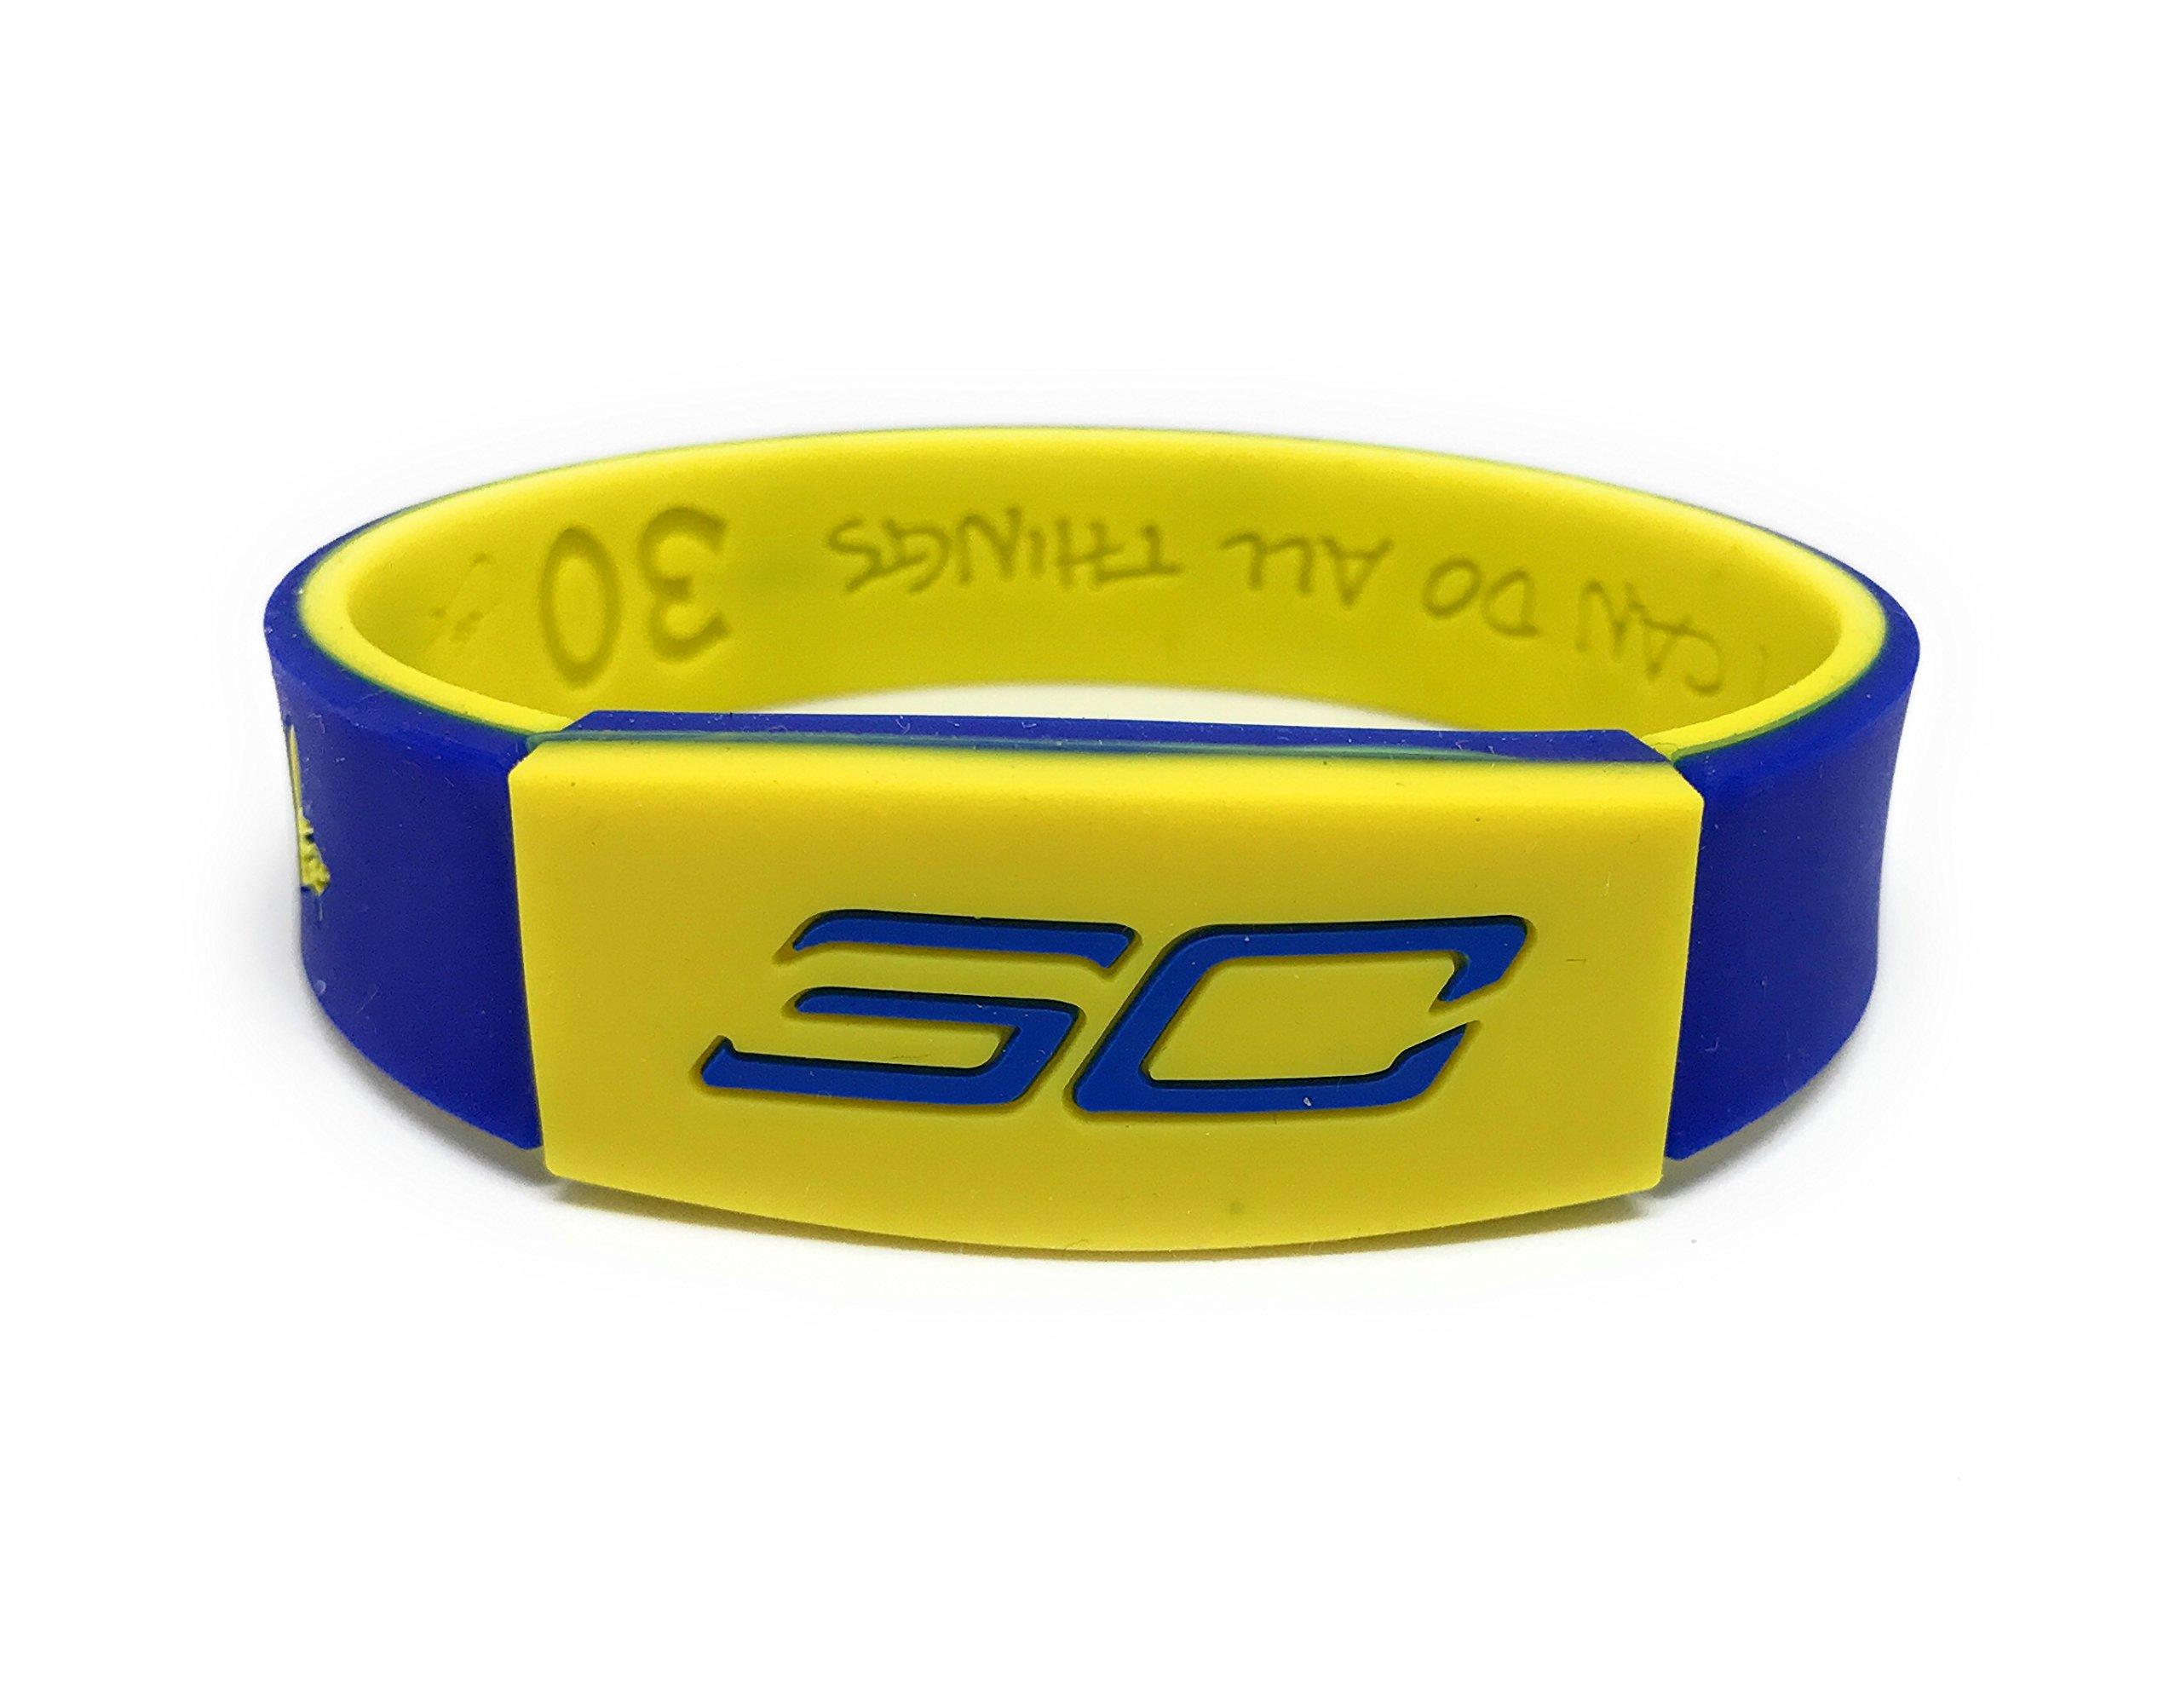 SportsBraceletsPro KIDS REVERSIBLE Wristband SIZE 6.7'' Bracelet (Curry KID 6.7'' Blue/Yellow)